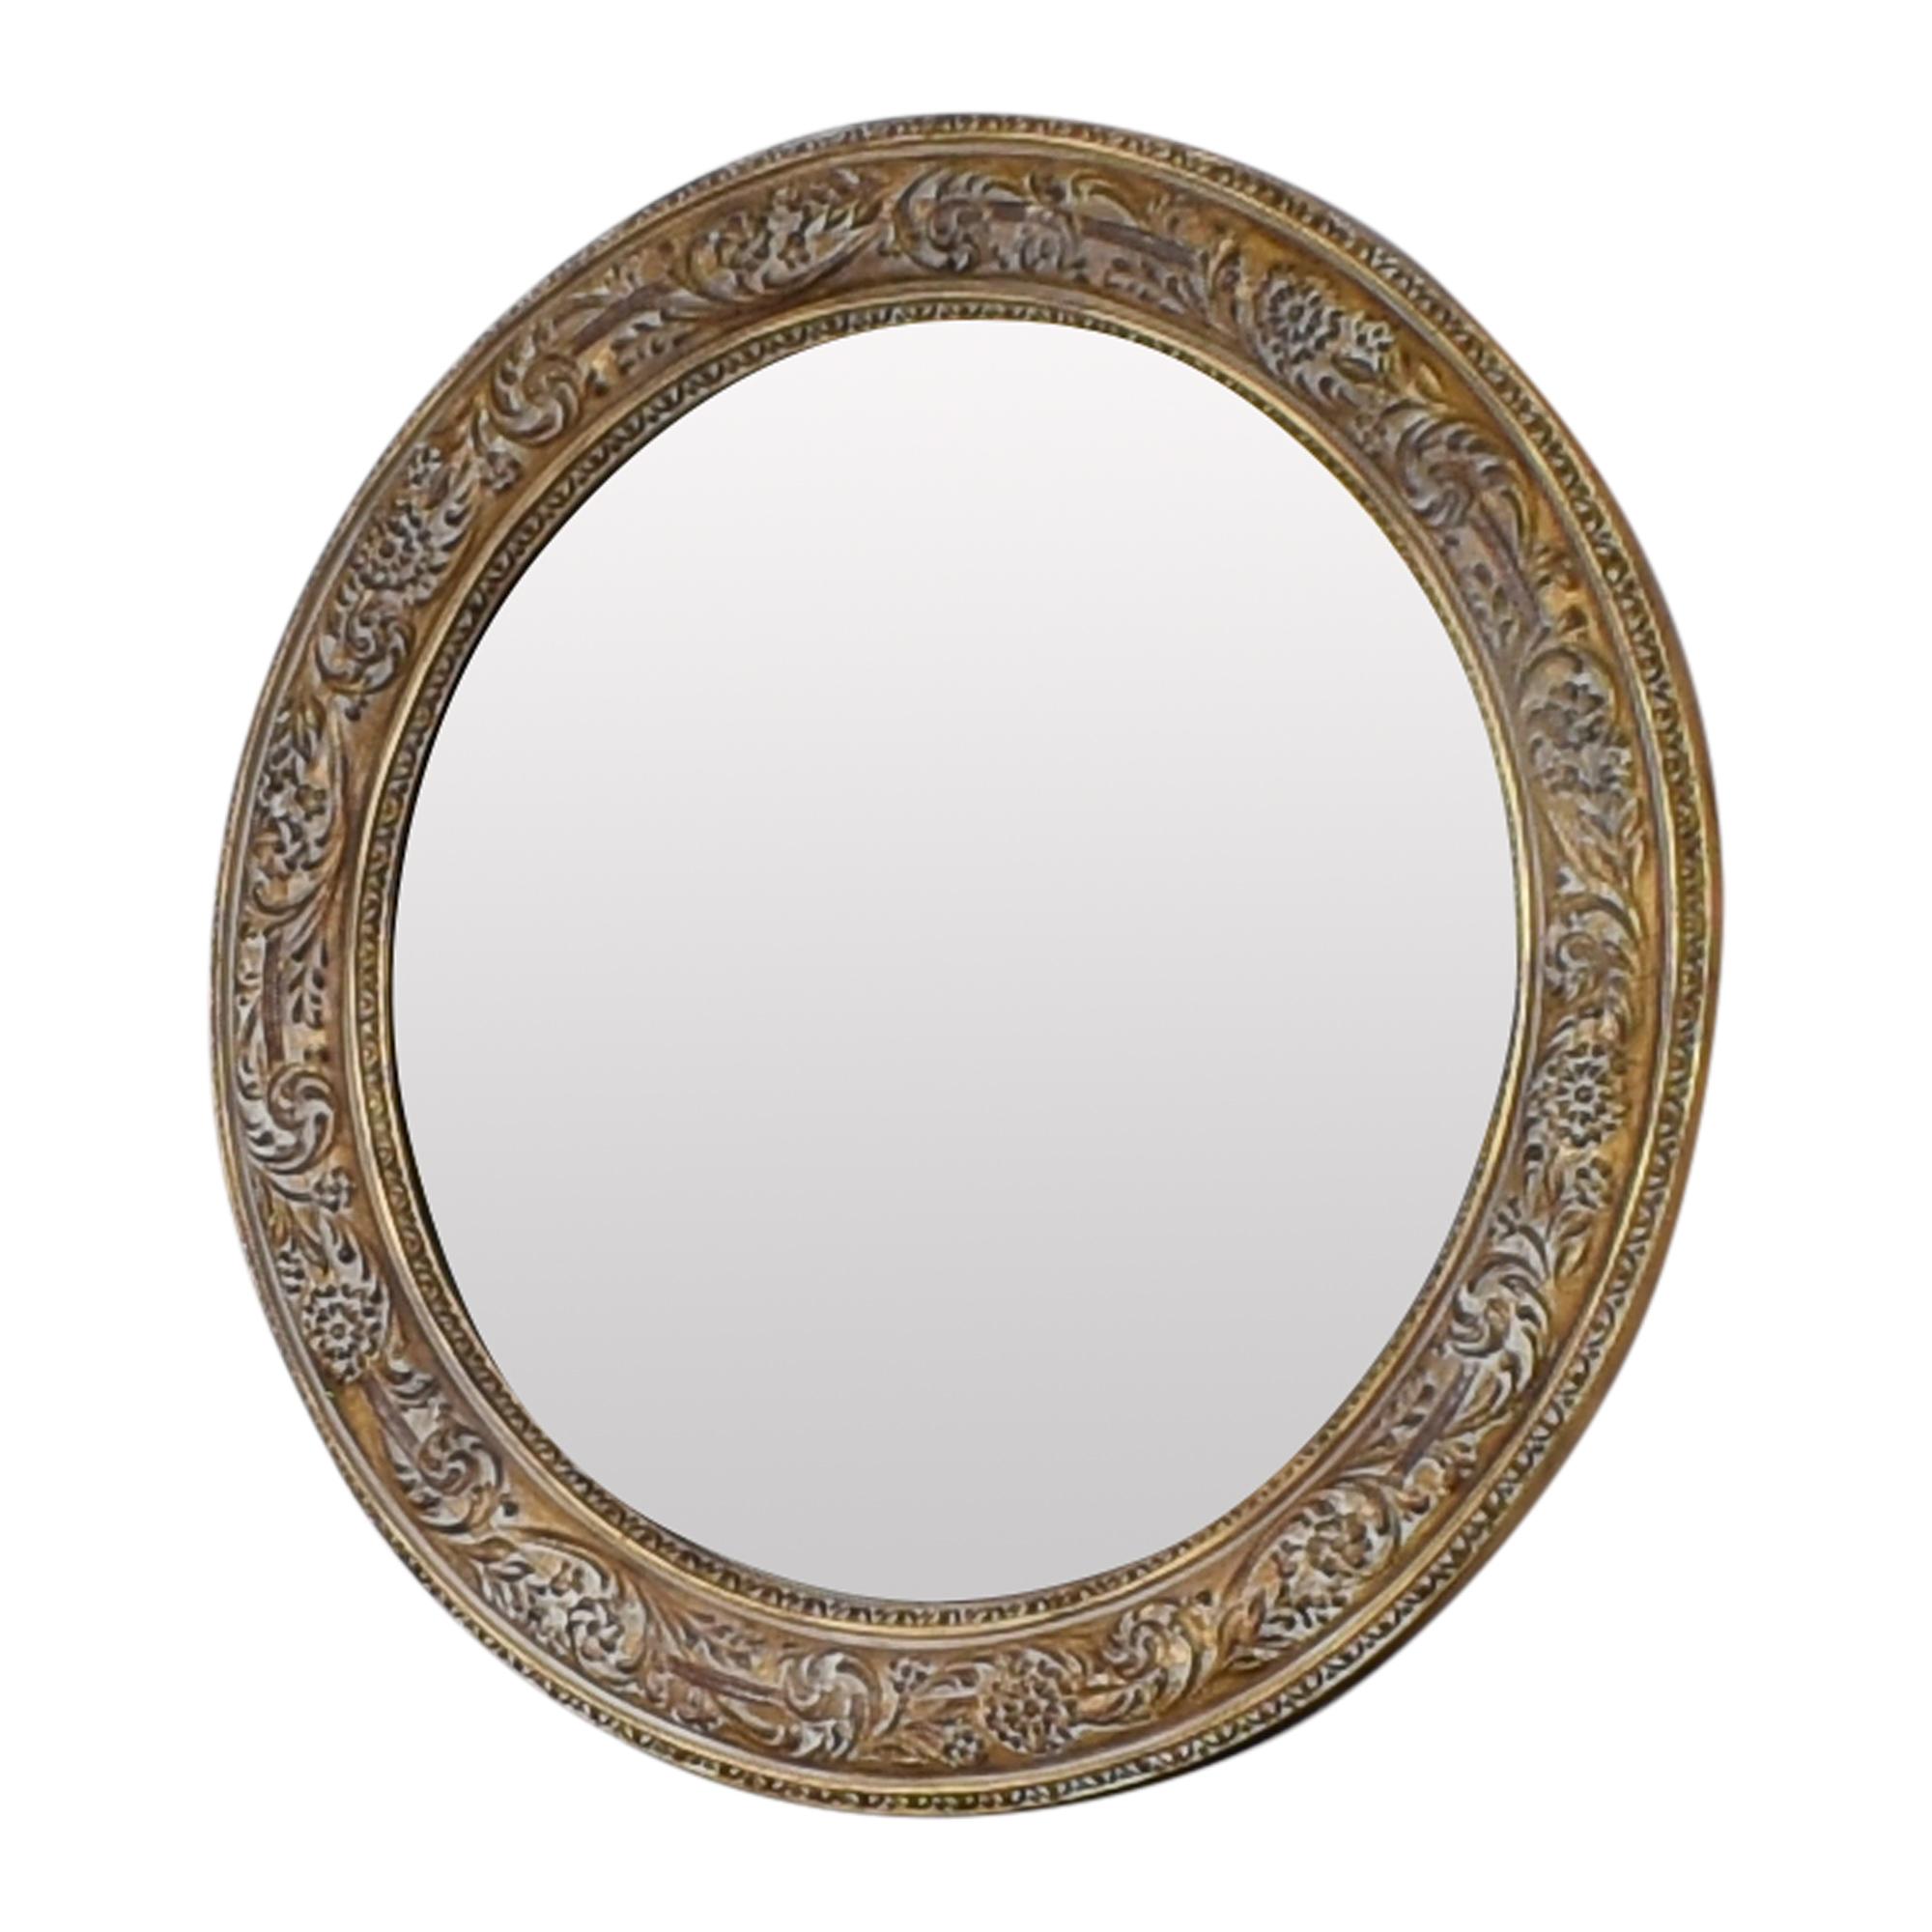 buy Ethan Allen Ornately Framed Mirror Ethan Allen Mirrors